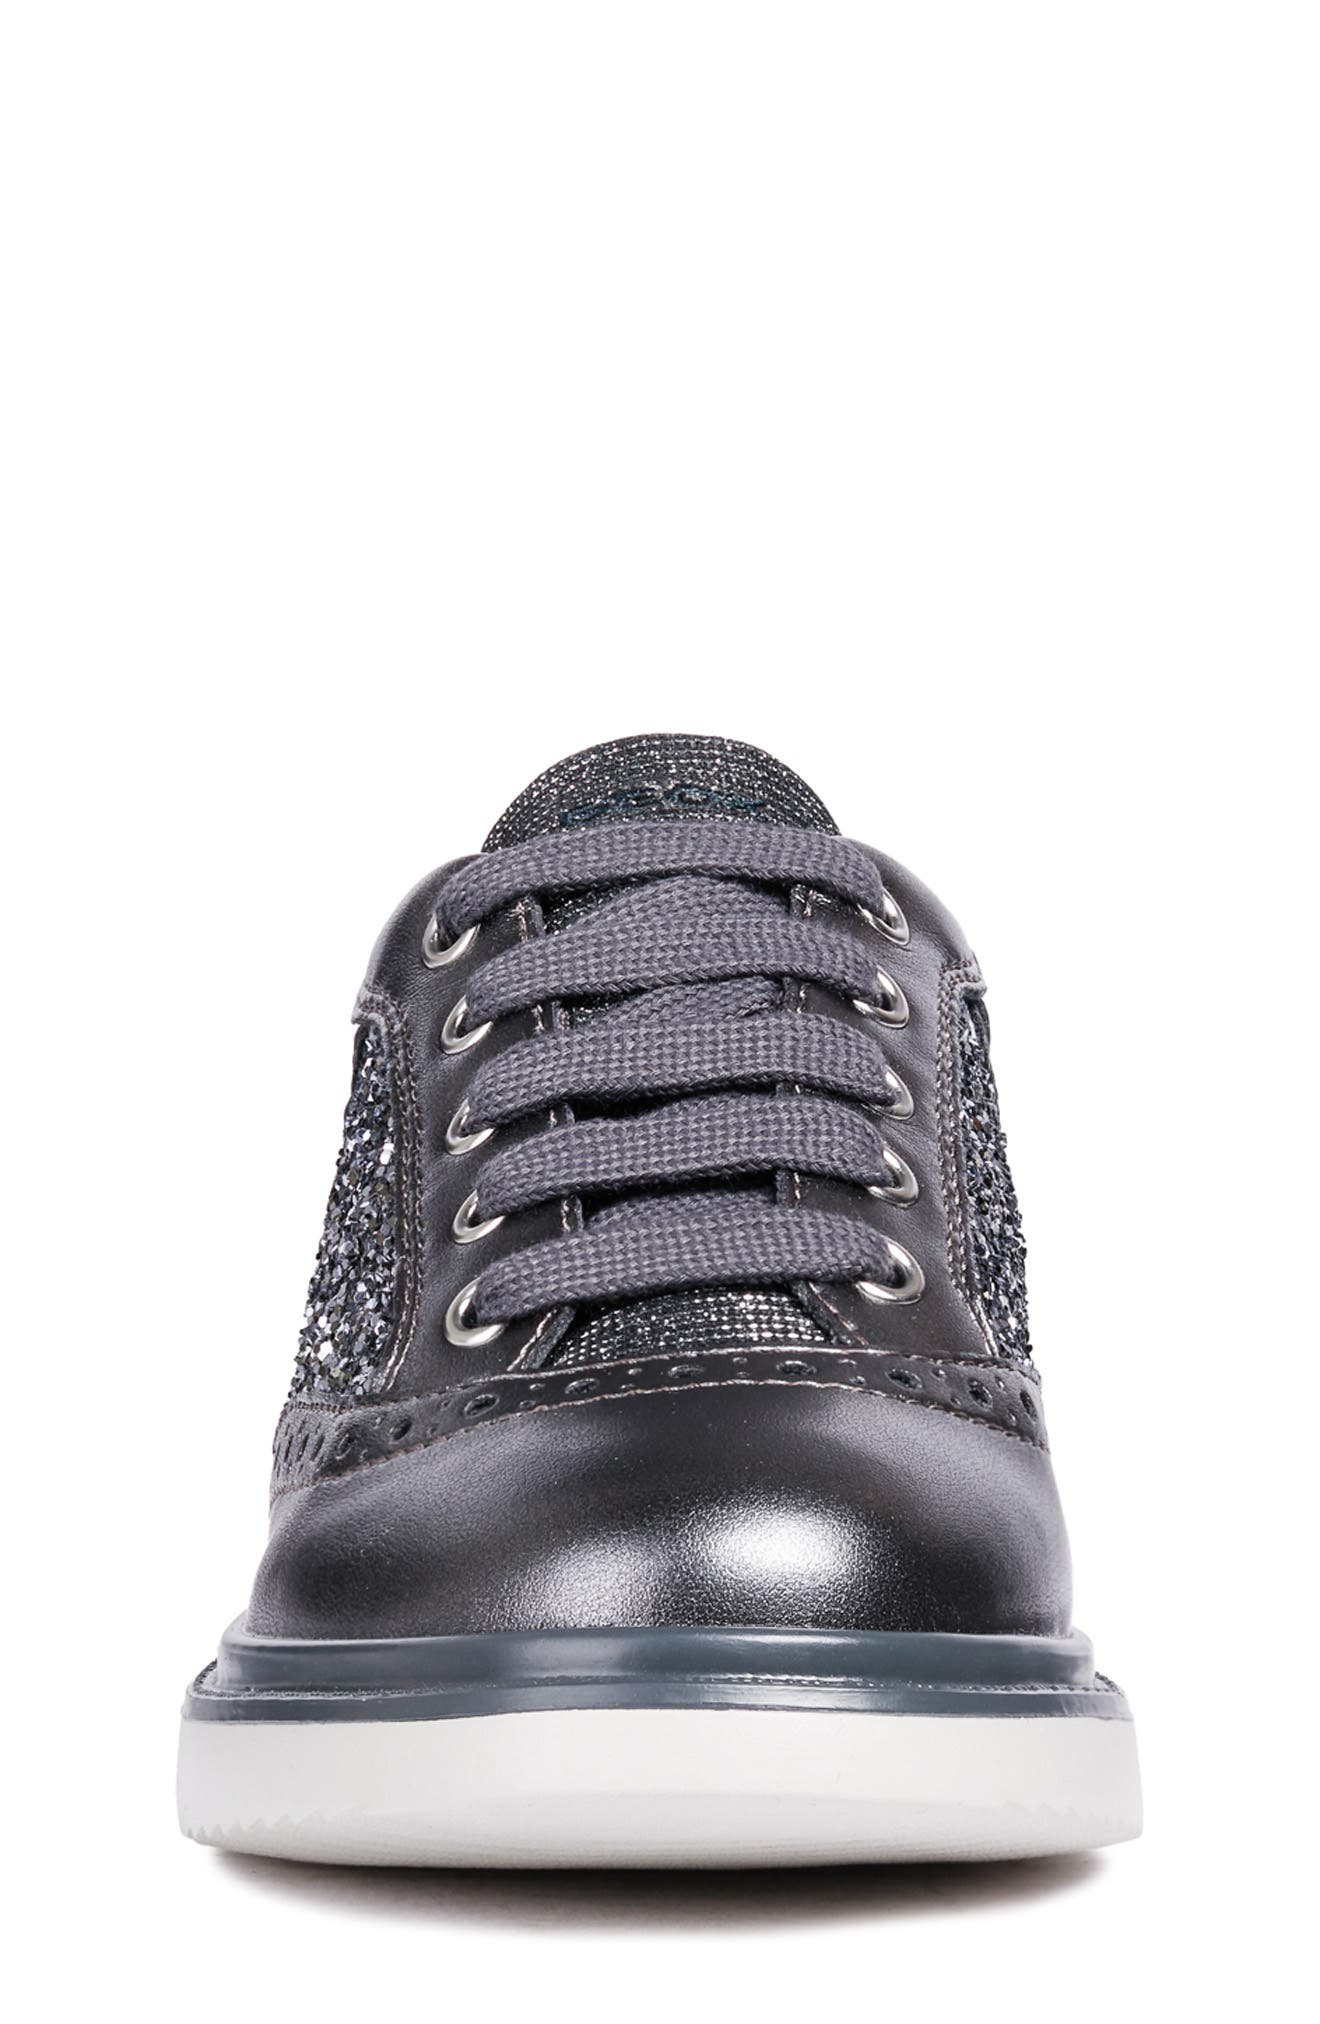 Thymar Sparkle Sneaker,                             Alternate thumbnail 4, color,                             DARK SILVER